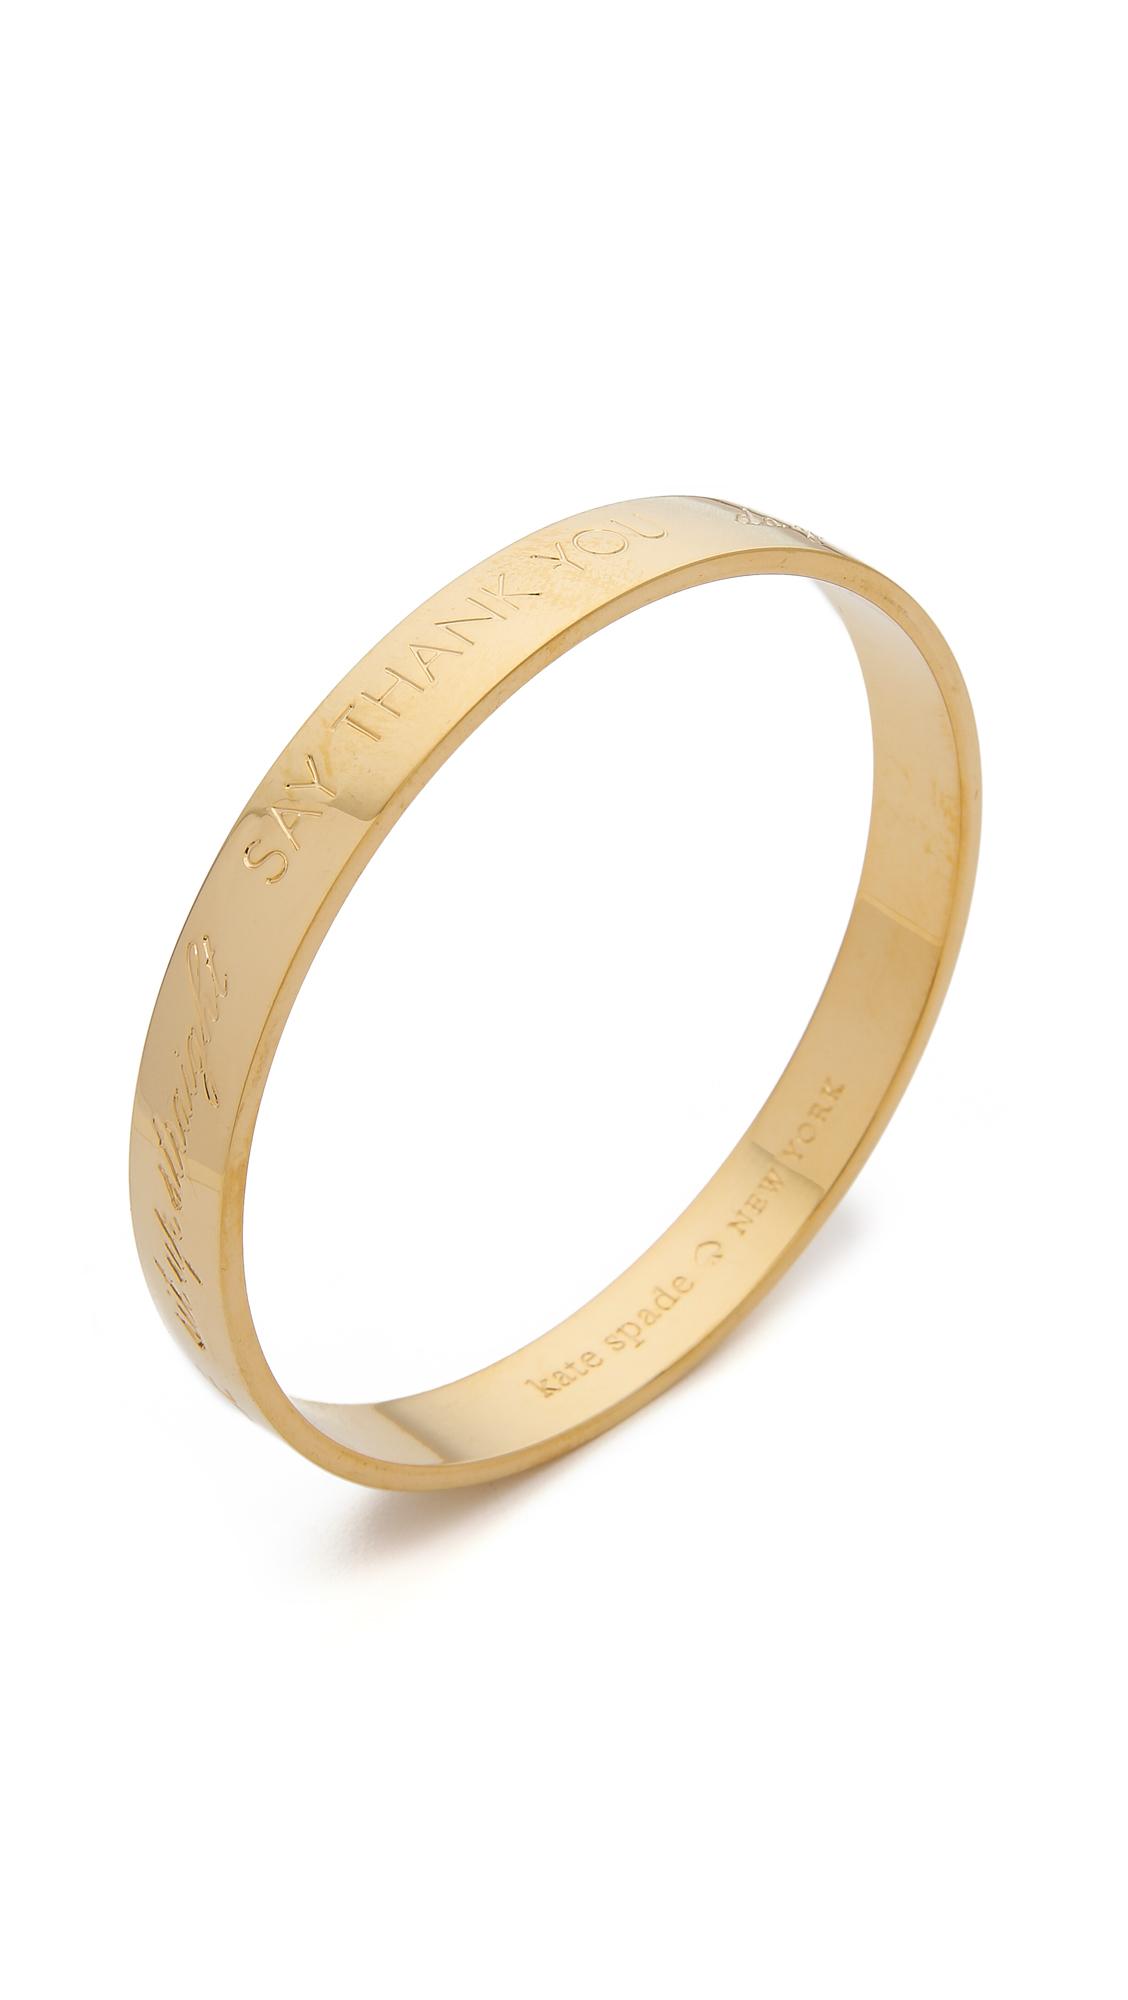 Kate Spade Mom Engraved Bangle Bracelet Gold In Metallic